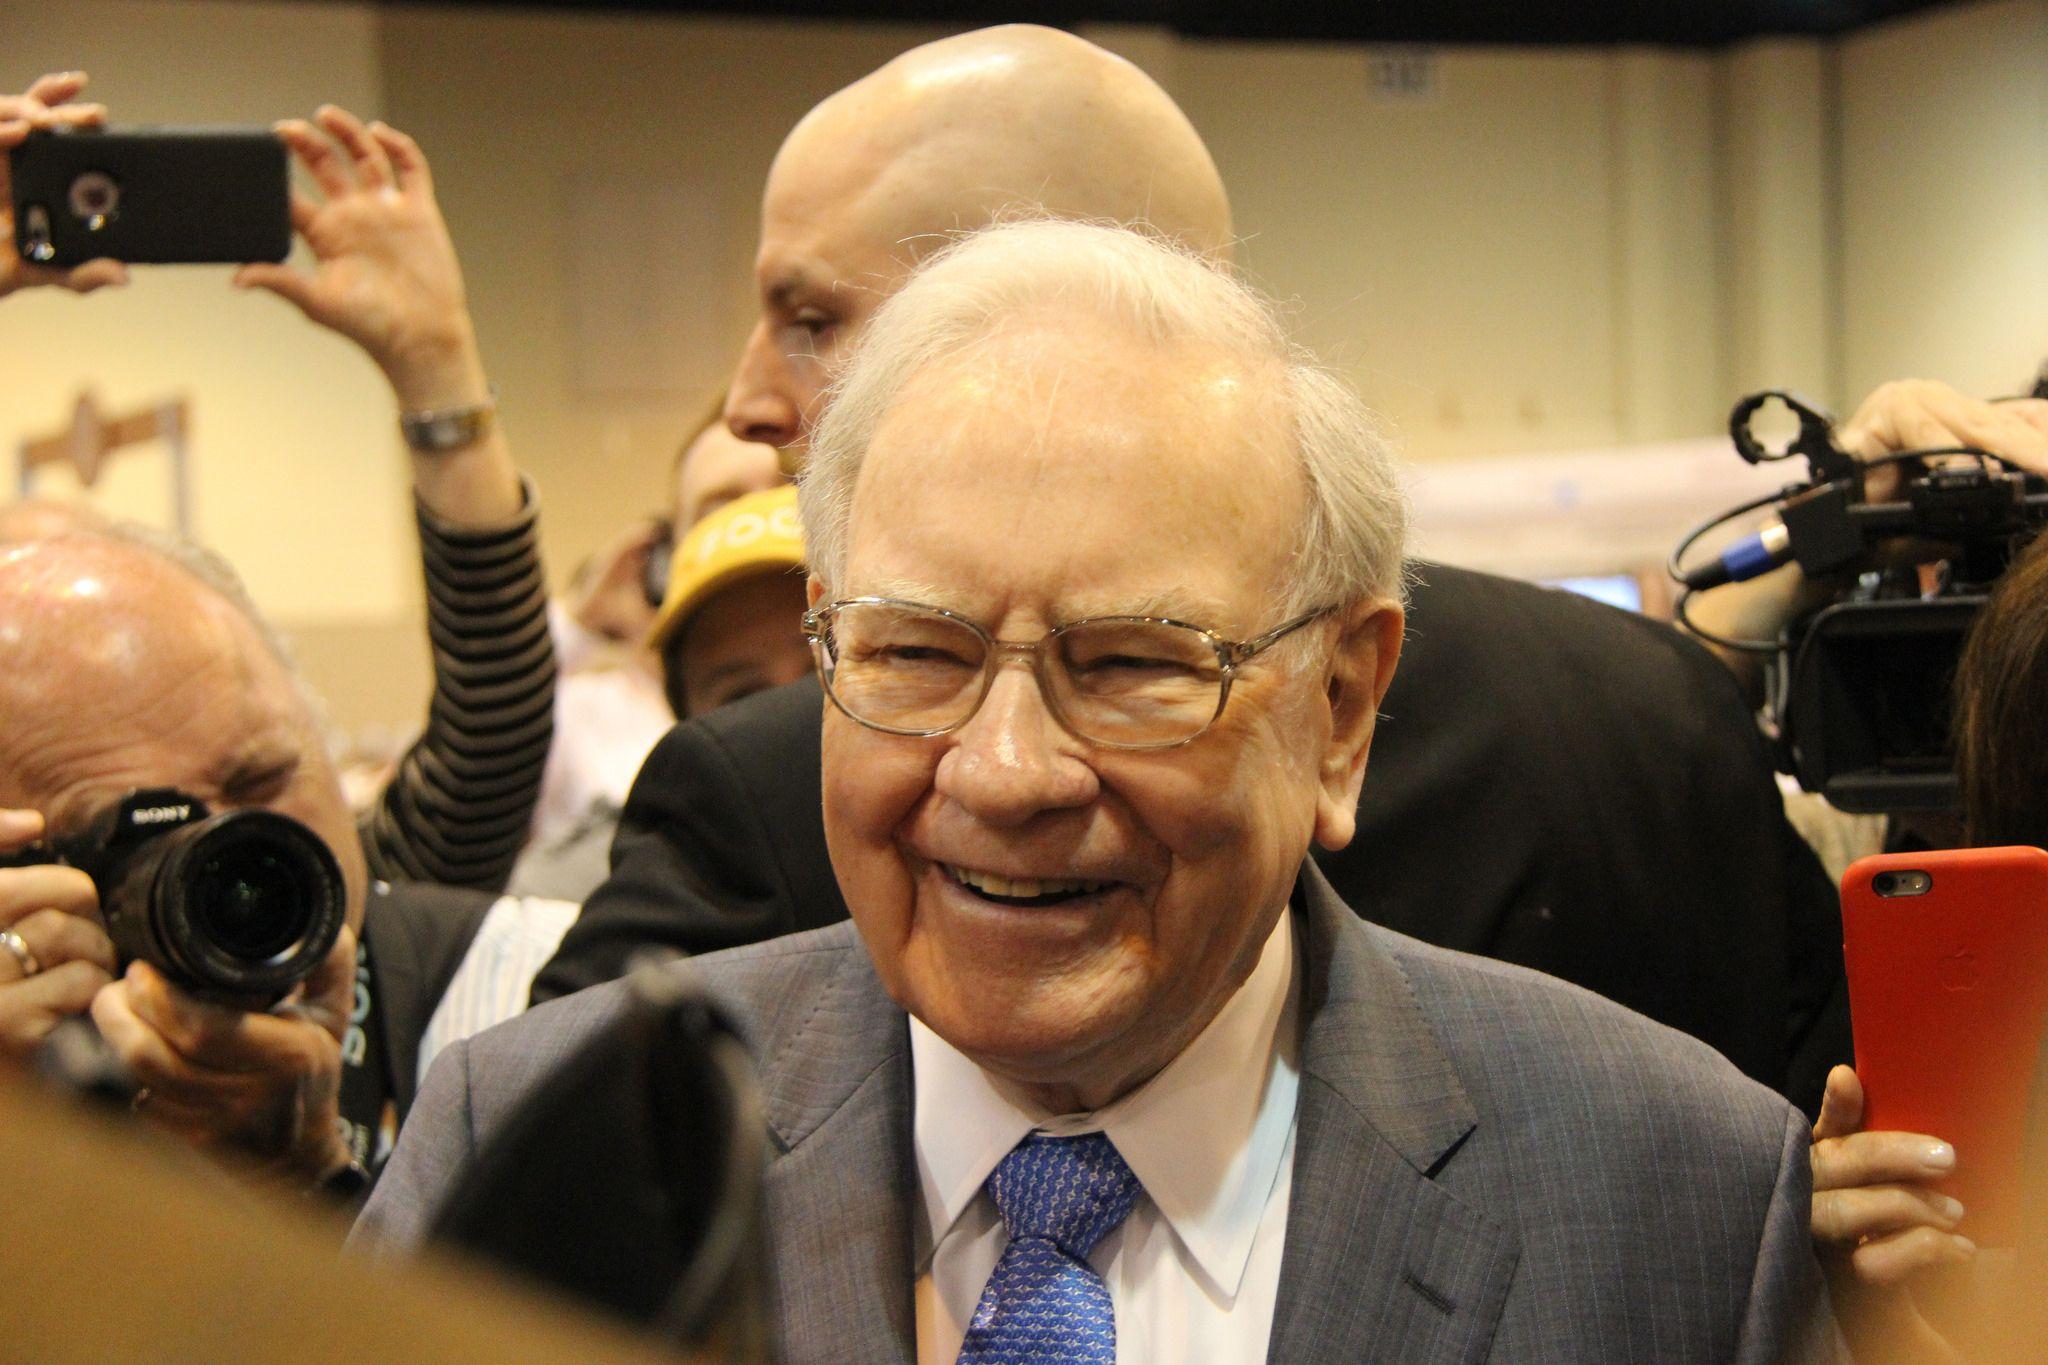 Warren Buffett at Berkshire Hathaway annual meeting, talking with reporters.